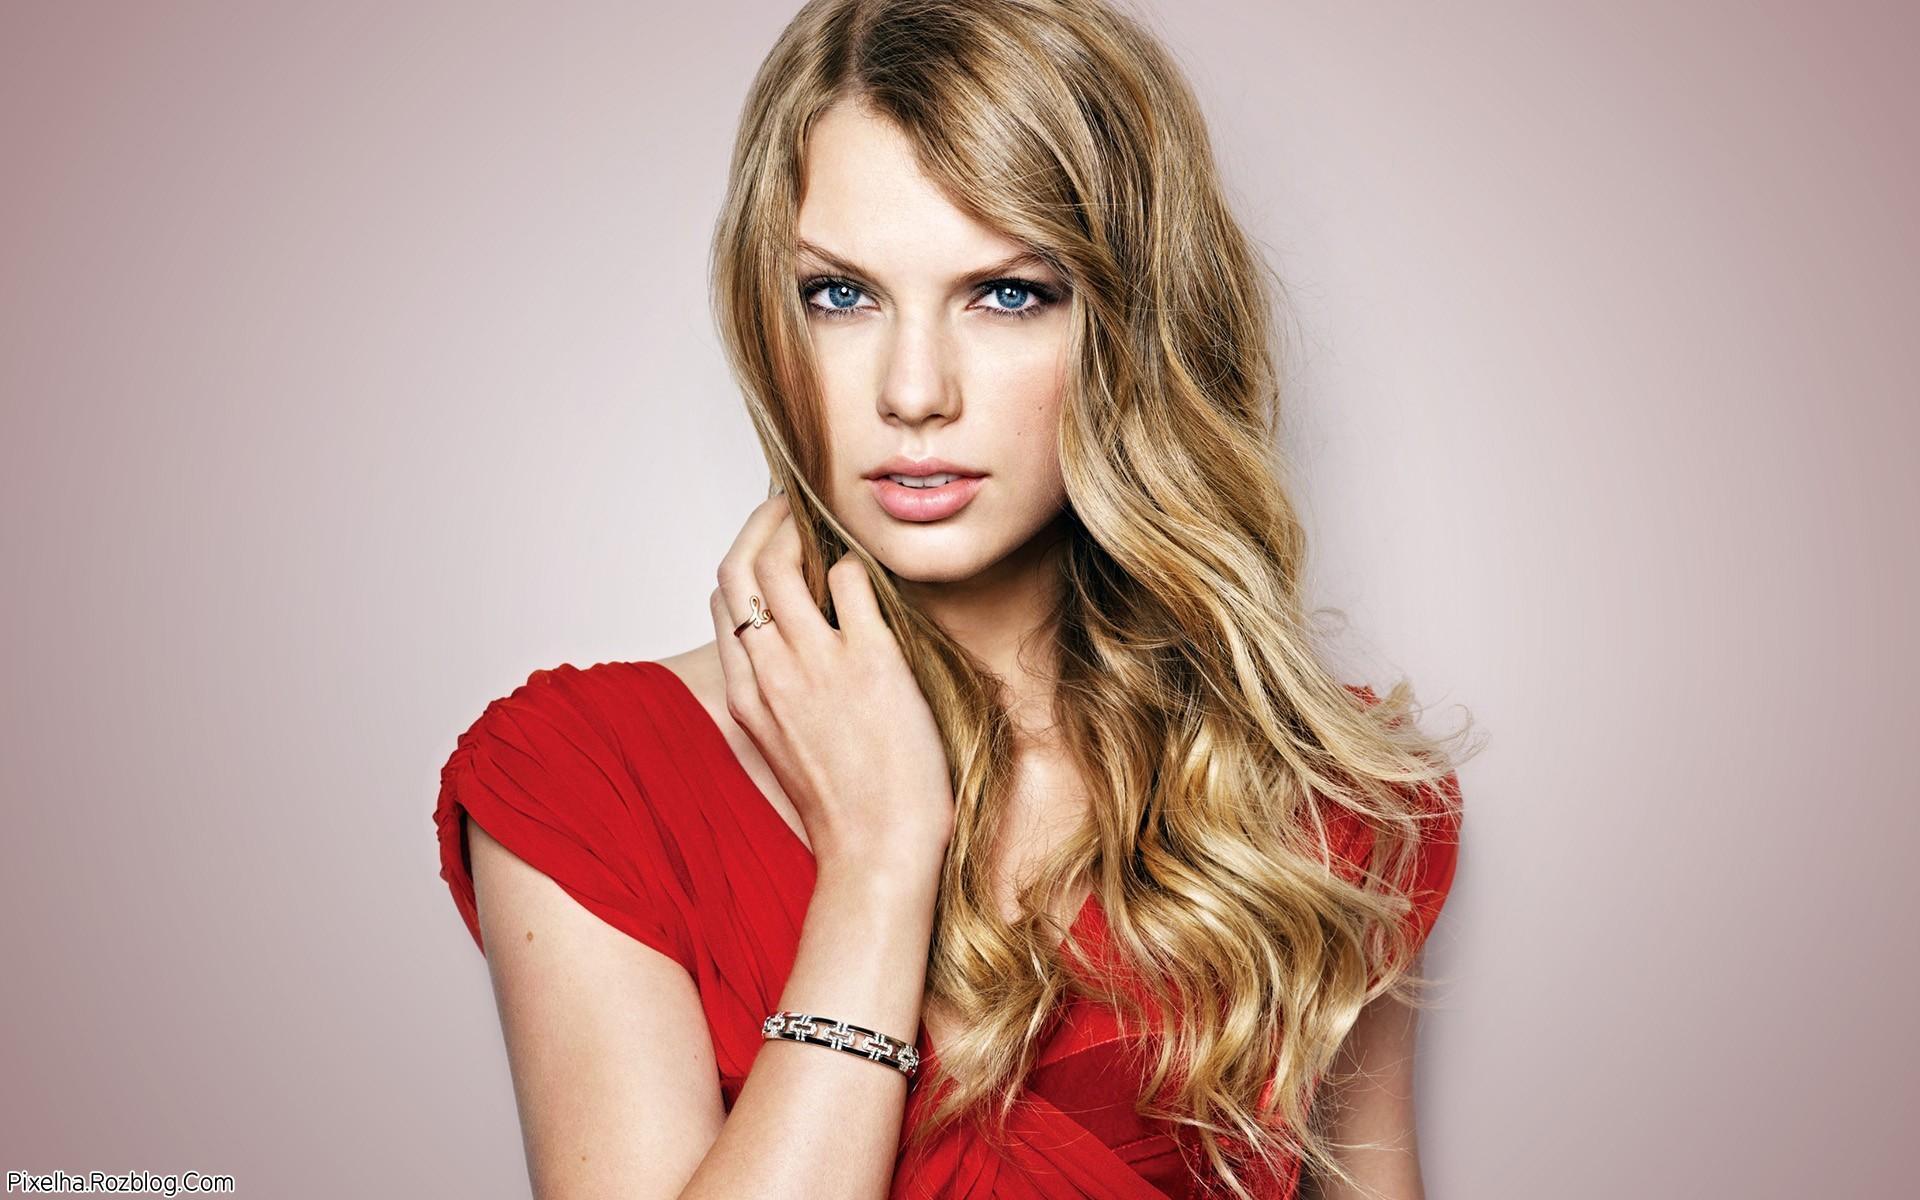 عکس Taylor Swift با لباس قرمز